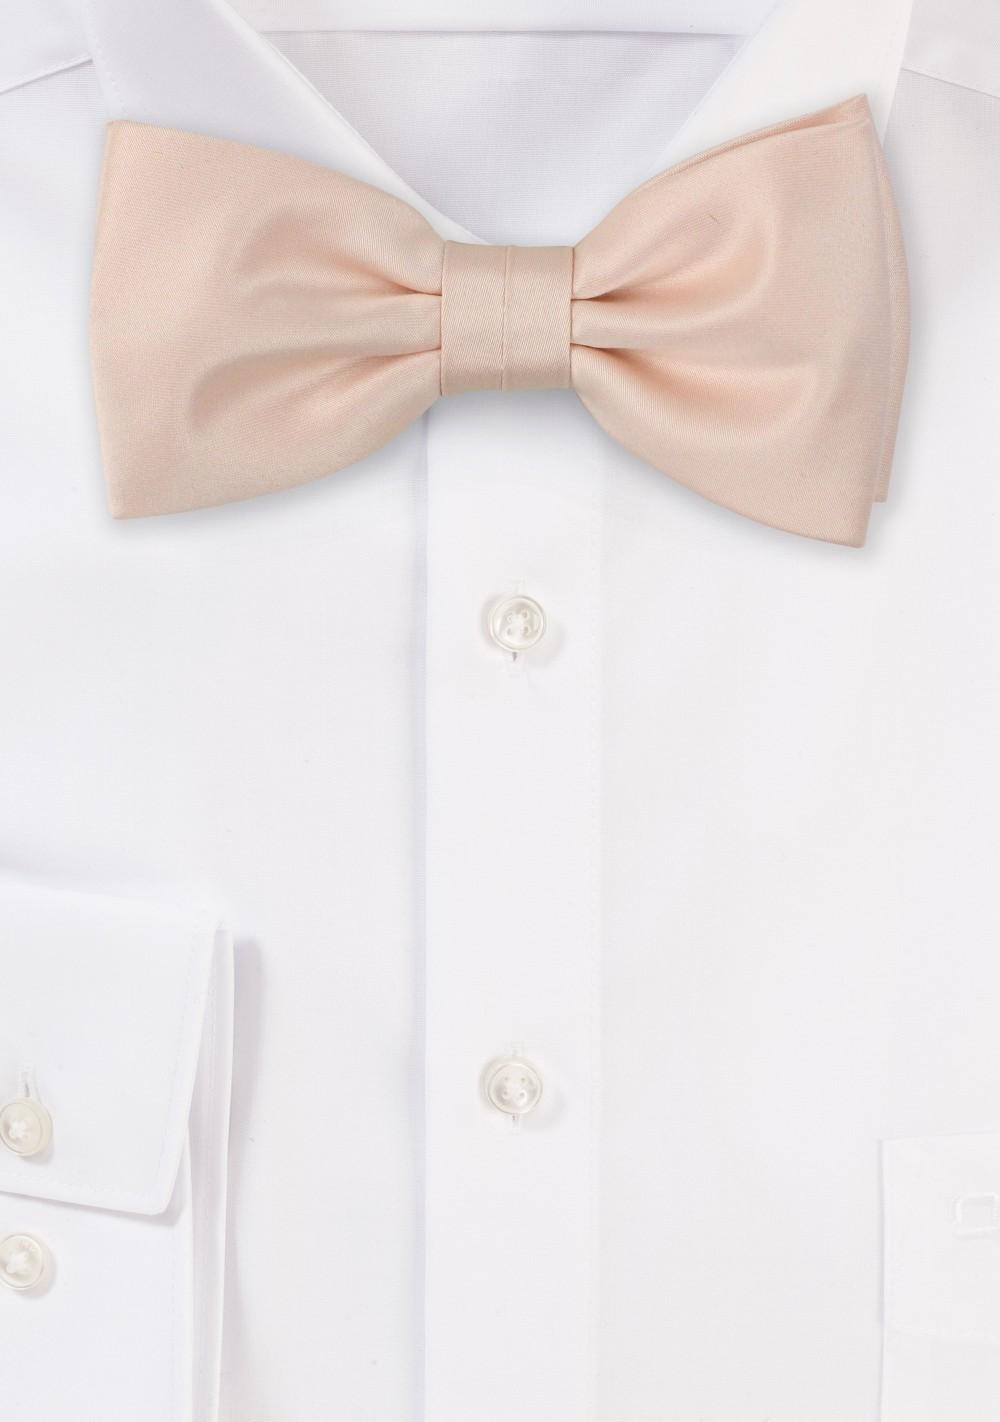 Antique Blush Satin Bow Tie